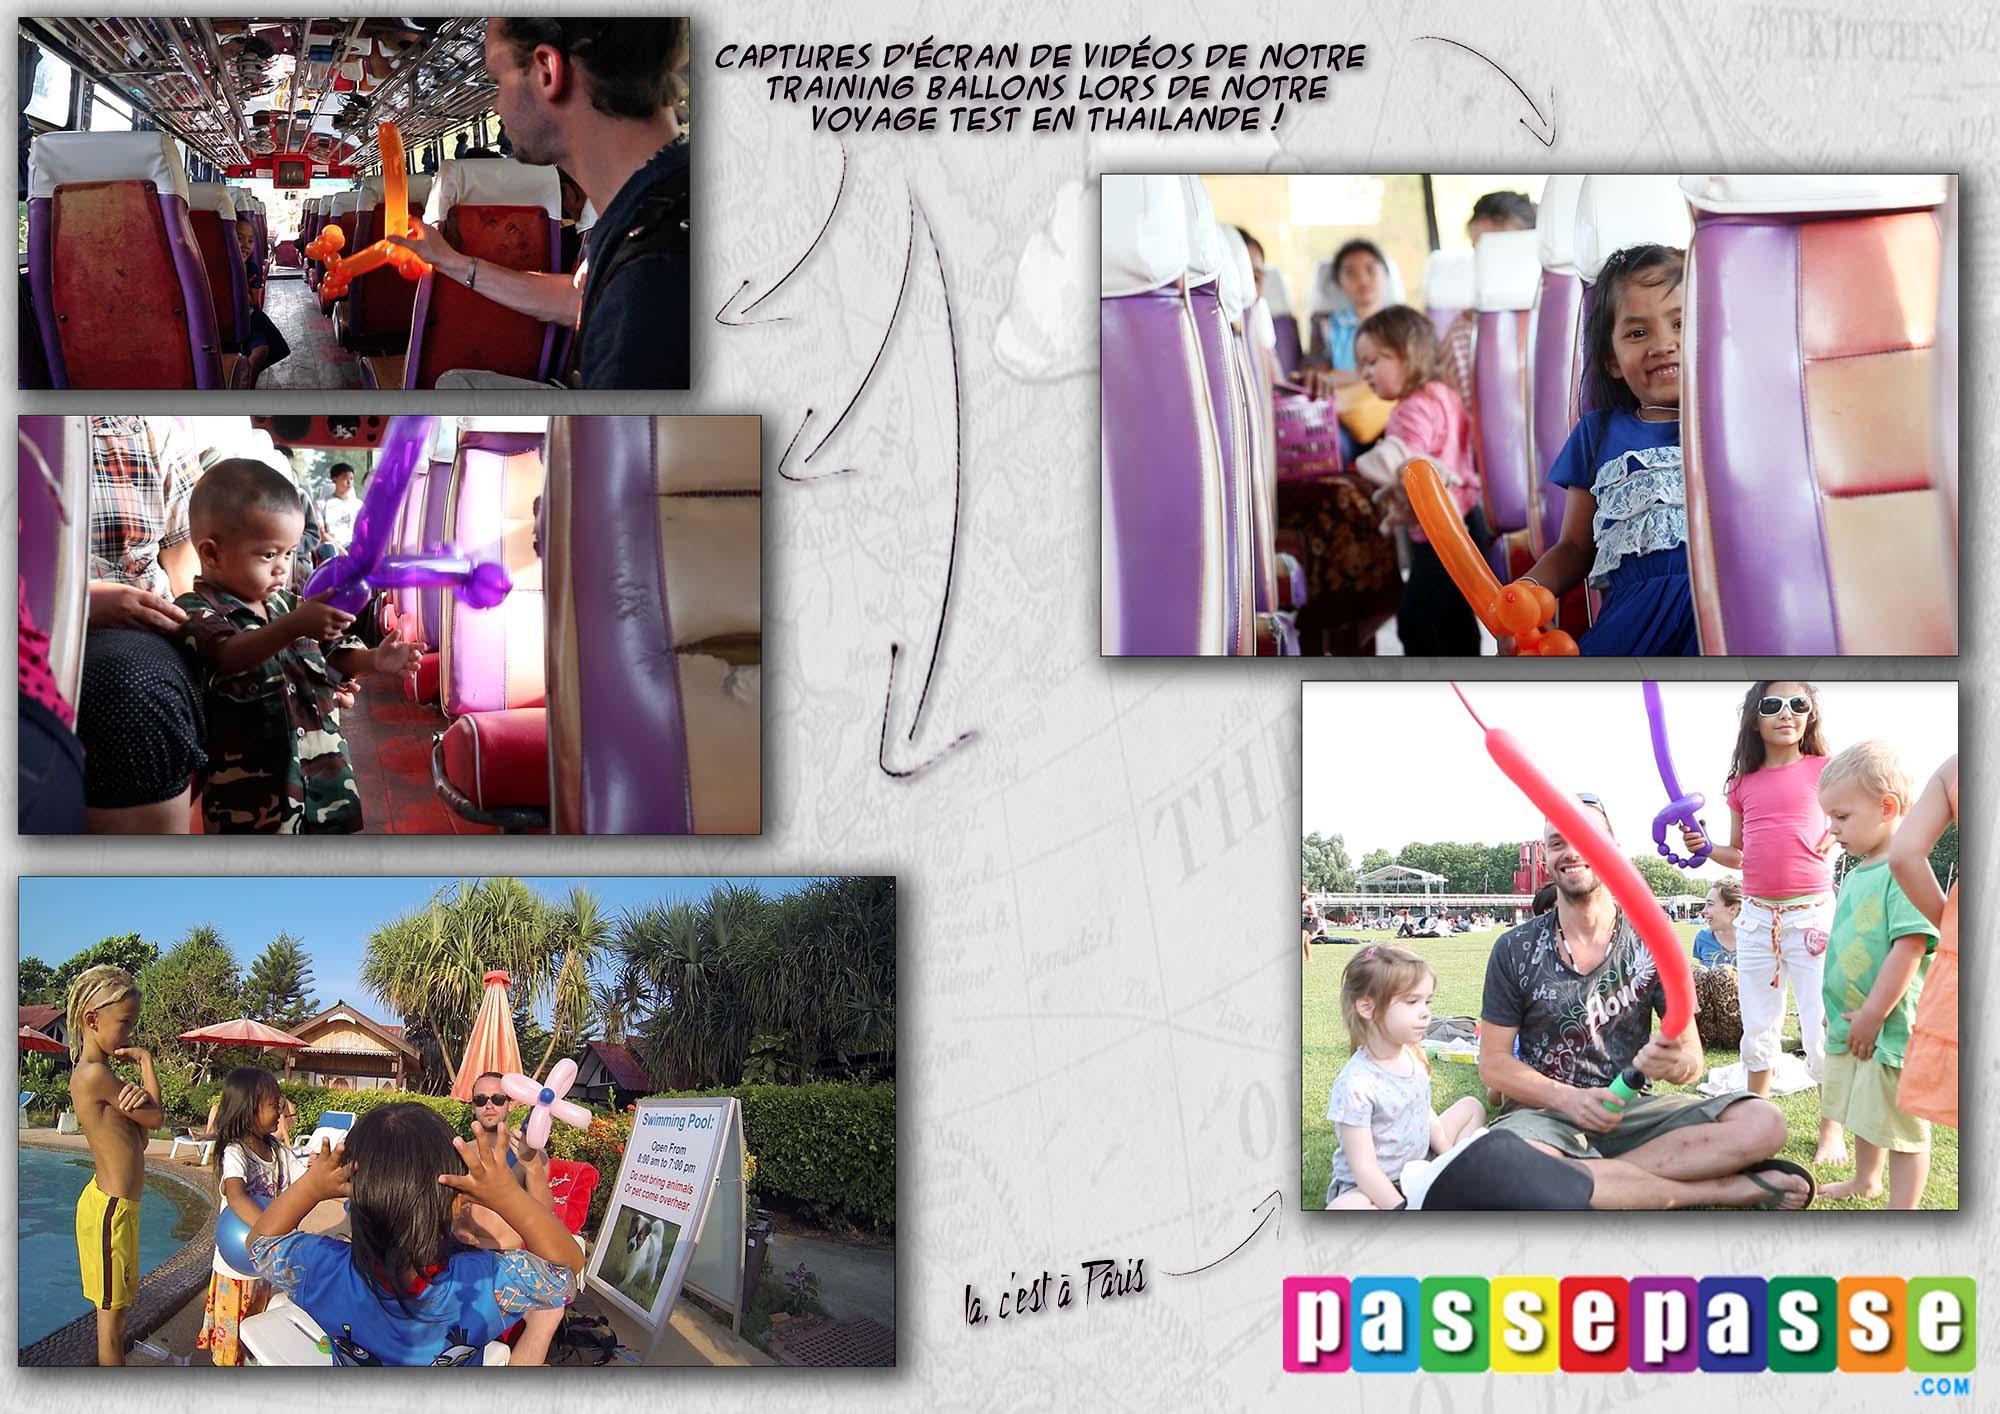 balloon Passe passe